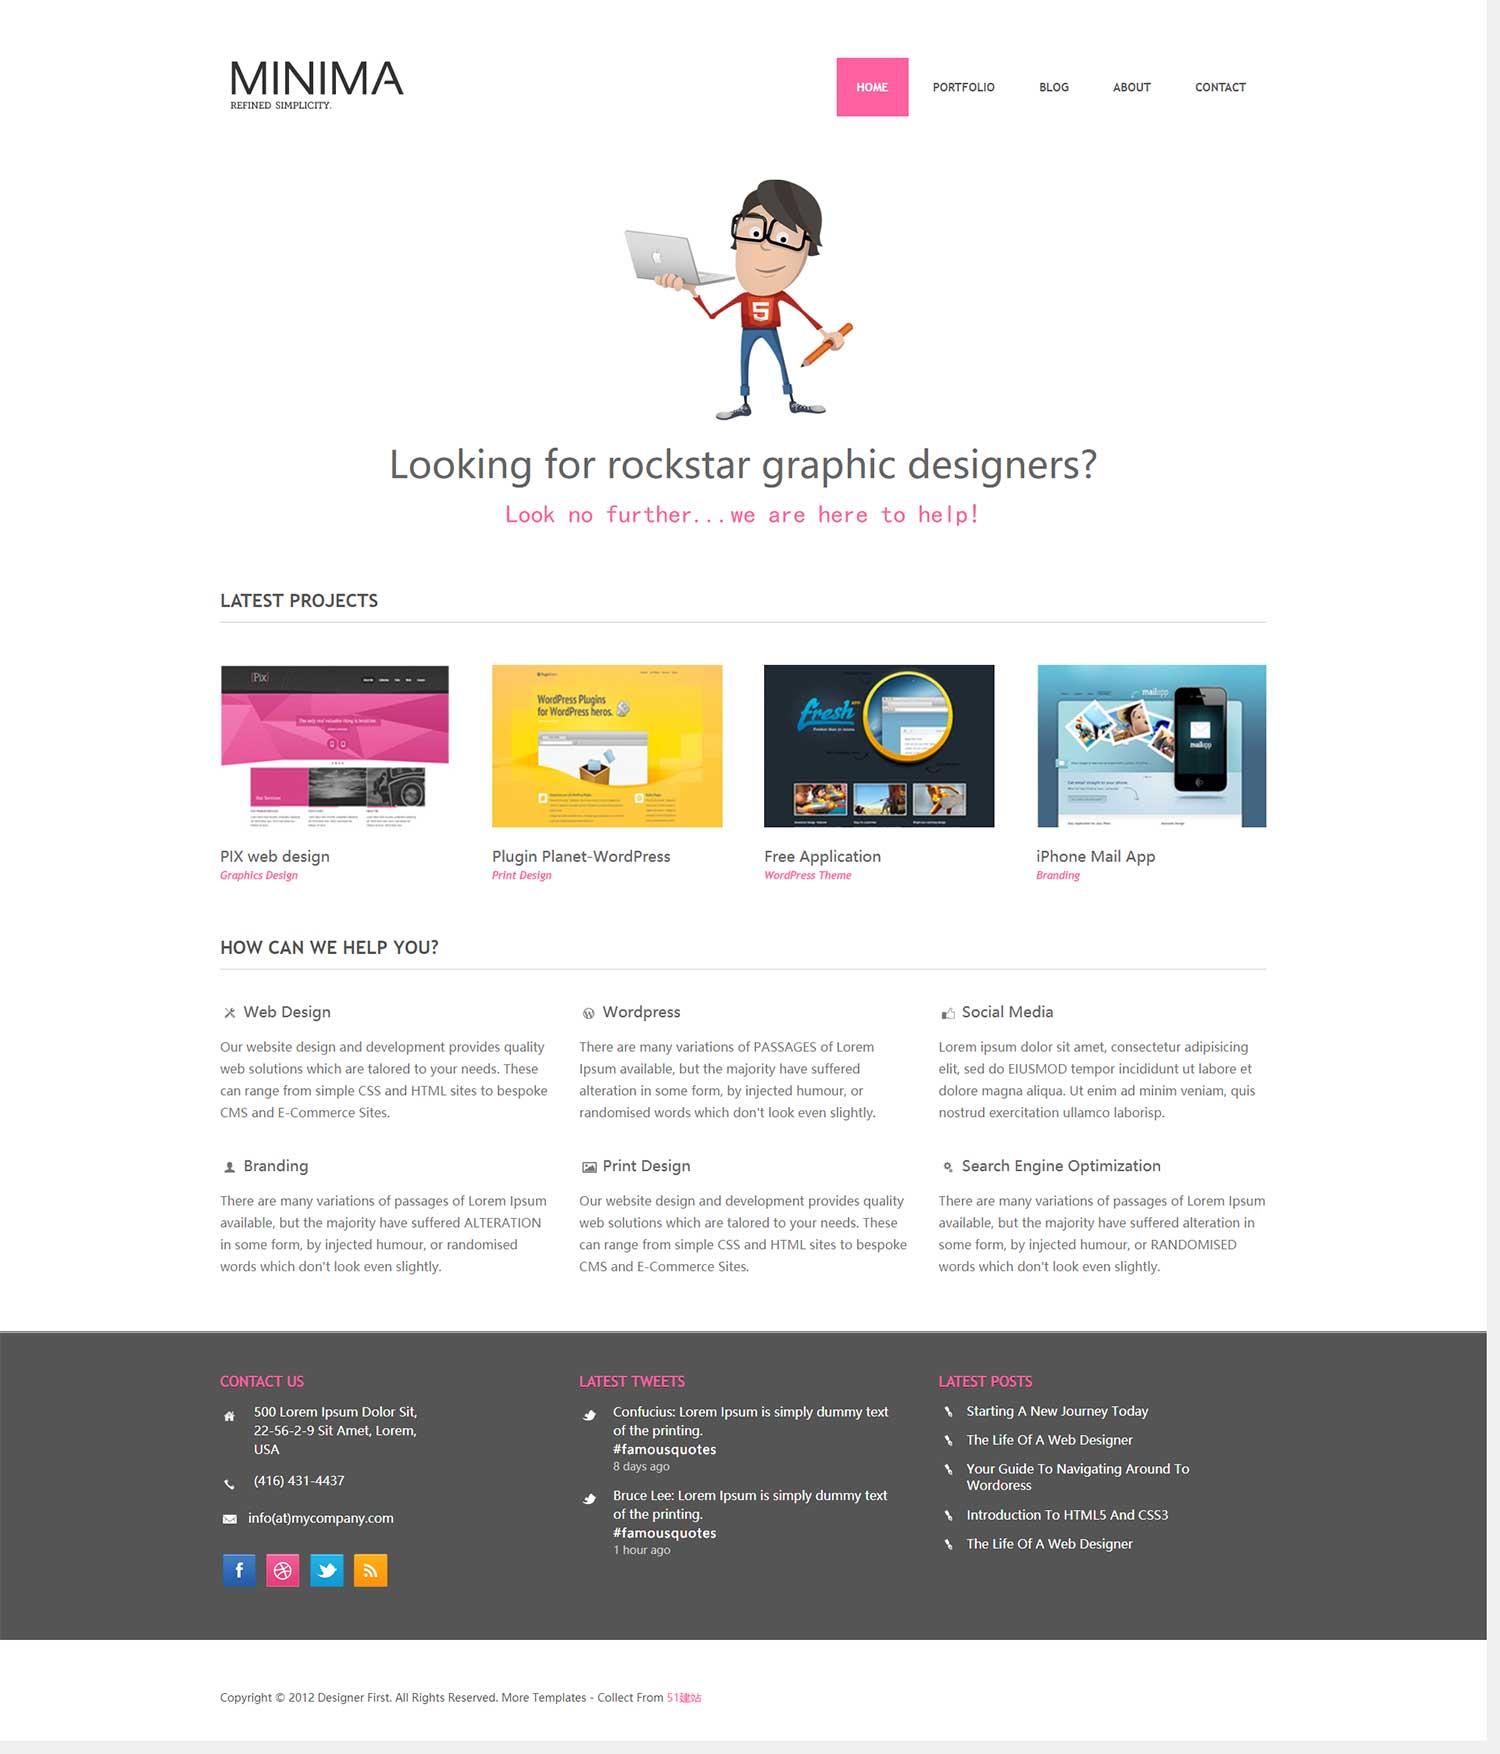 Minima简洁响应式设计师插画师程序员个人作品展示清晰商业外贸公司网页网站模板